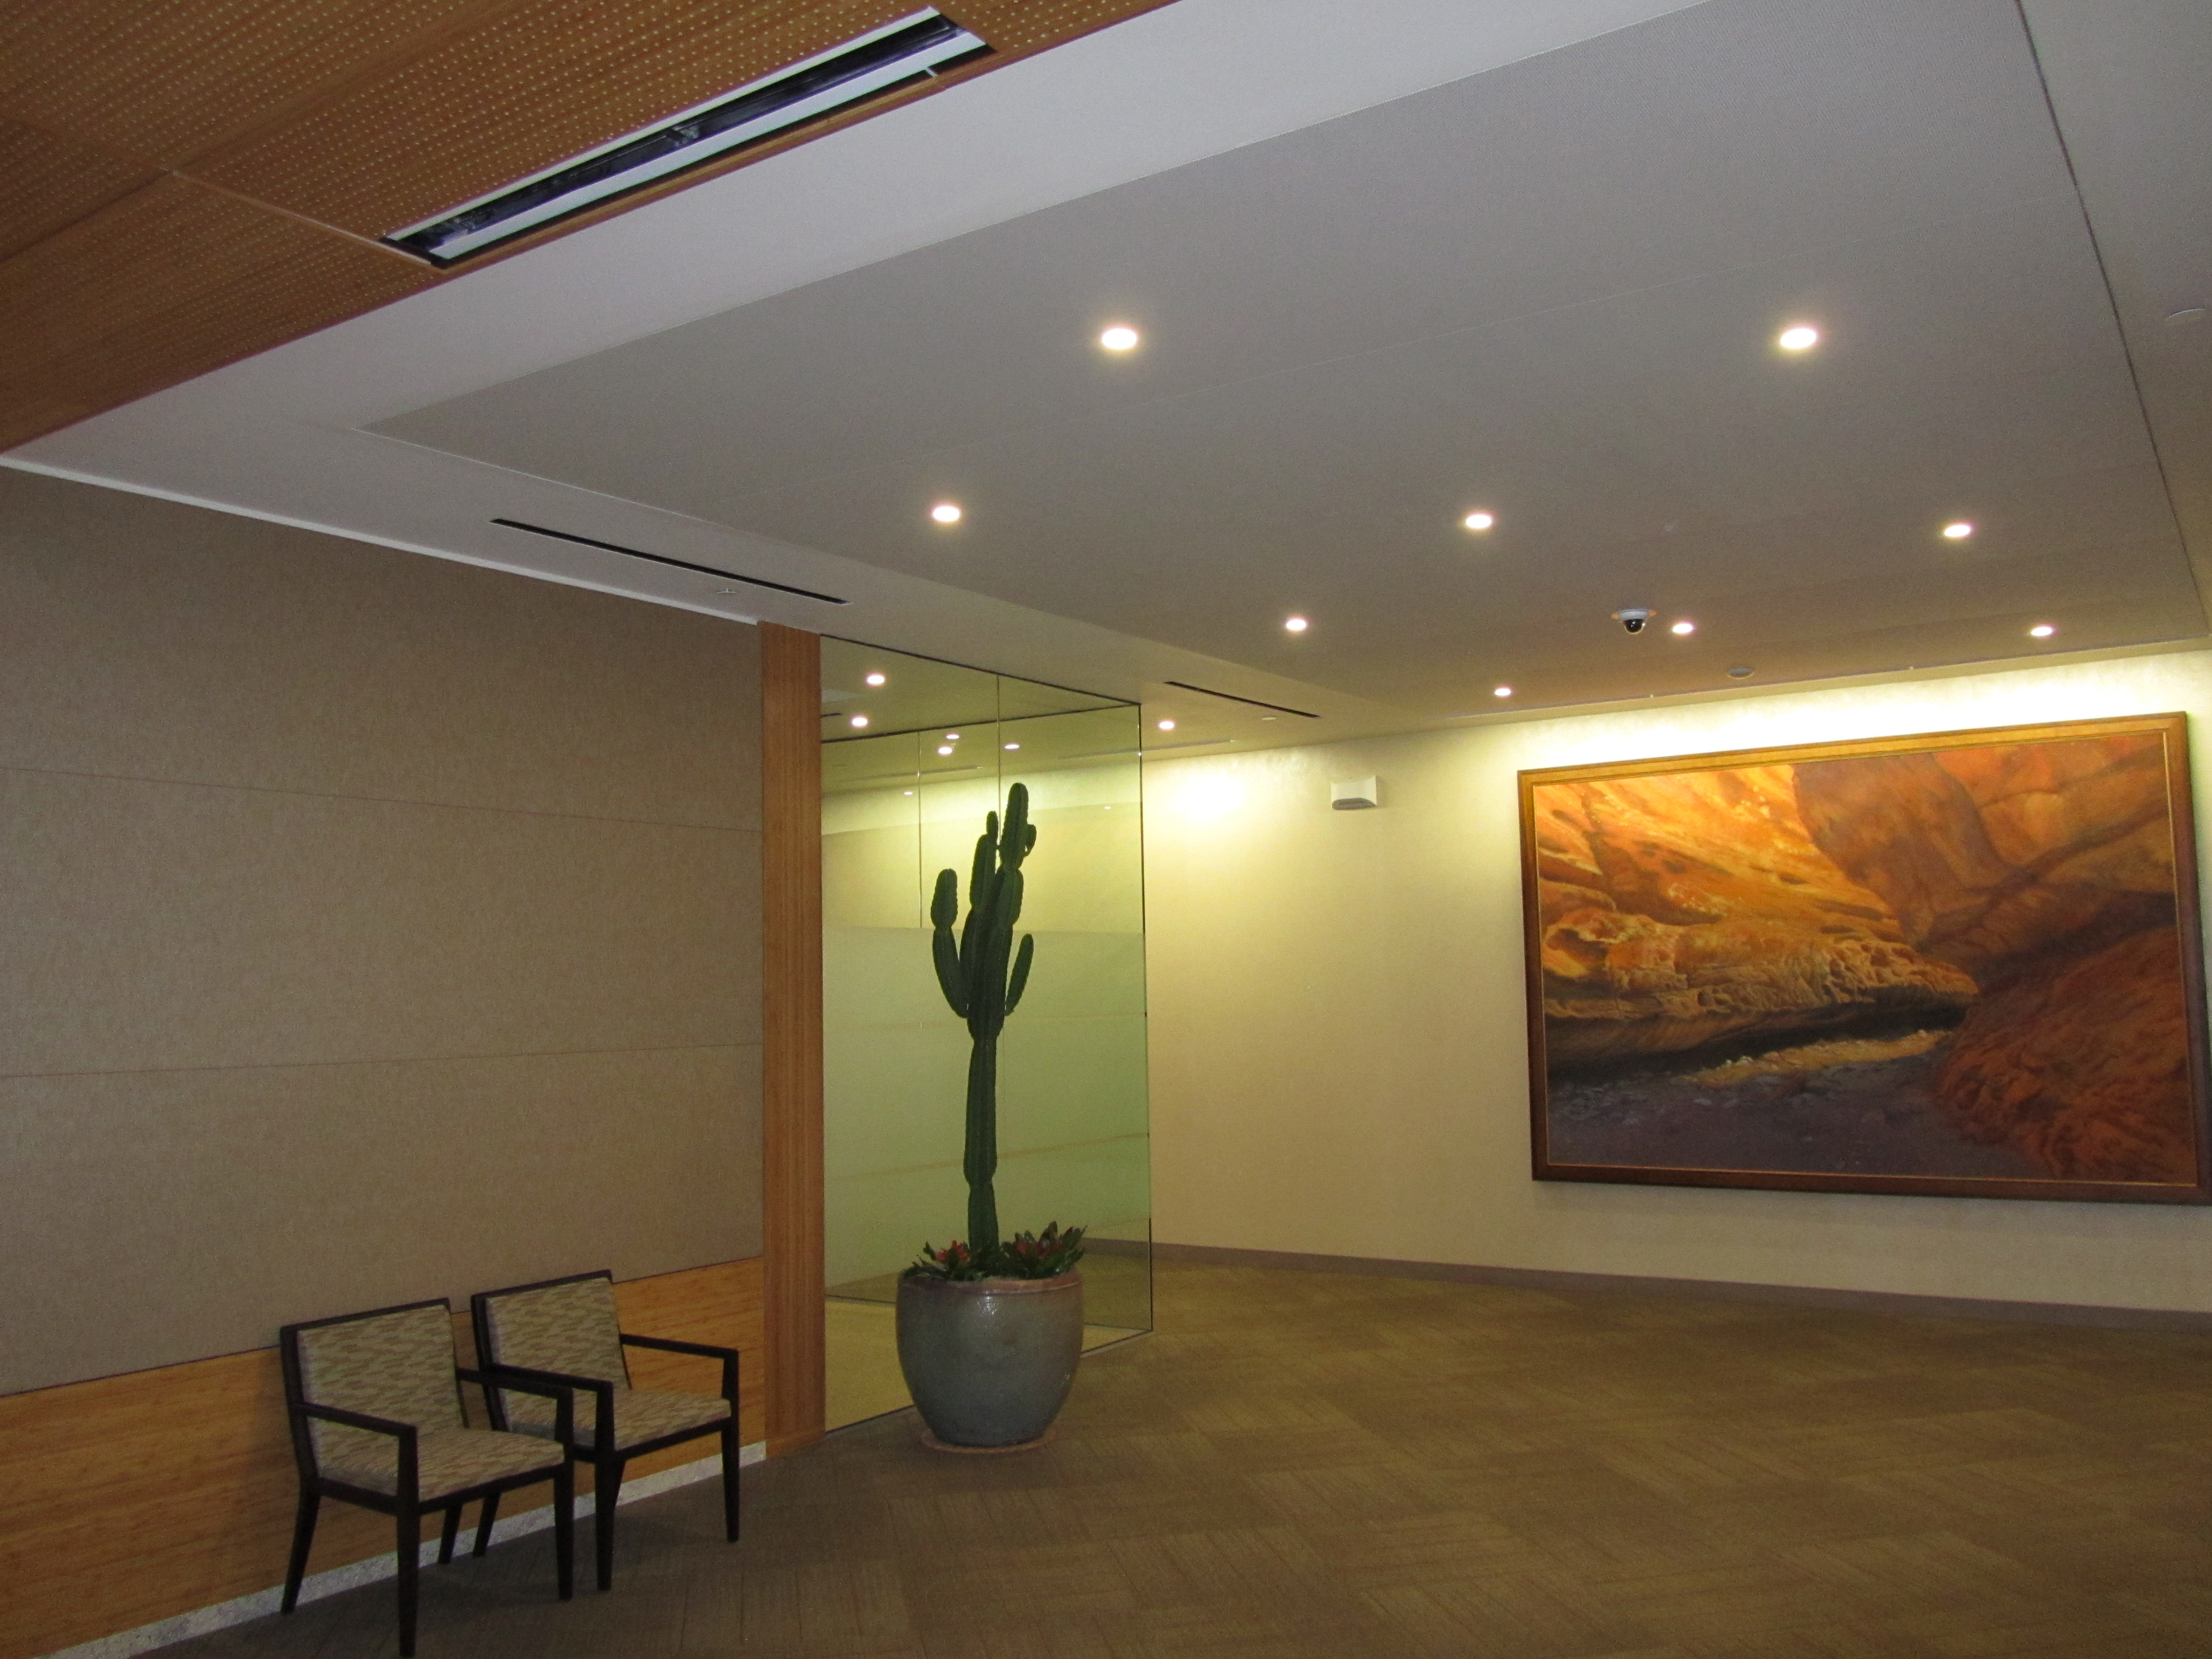 Floating ceiling tiles